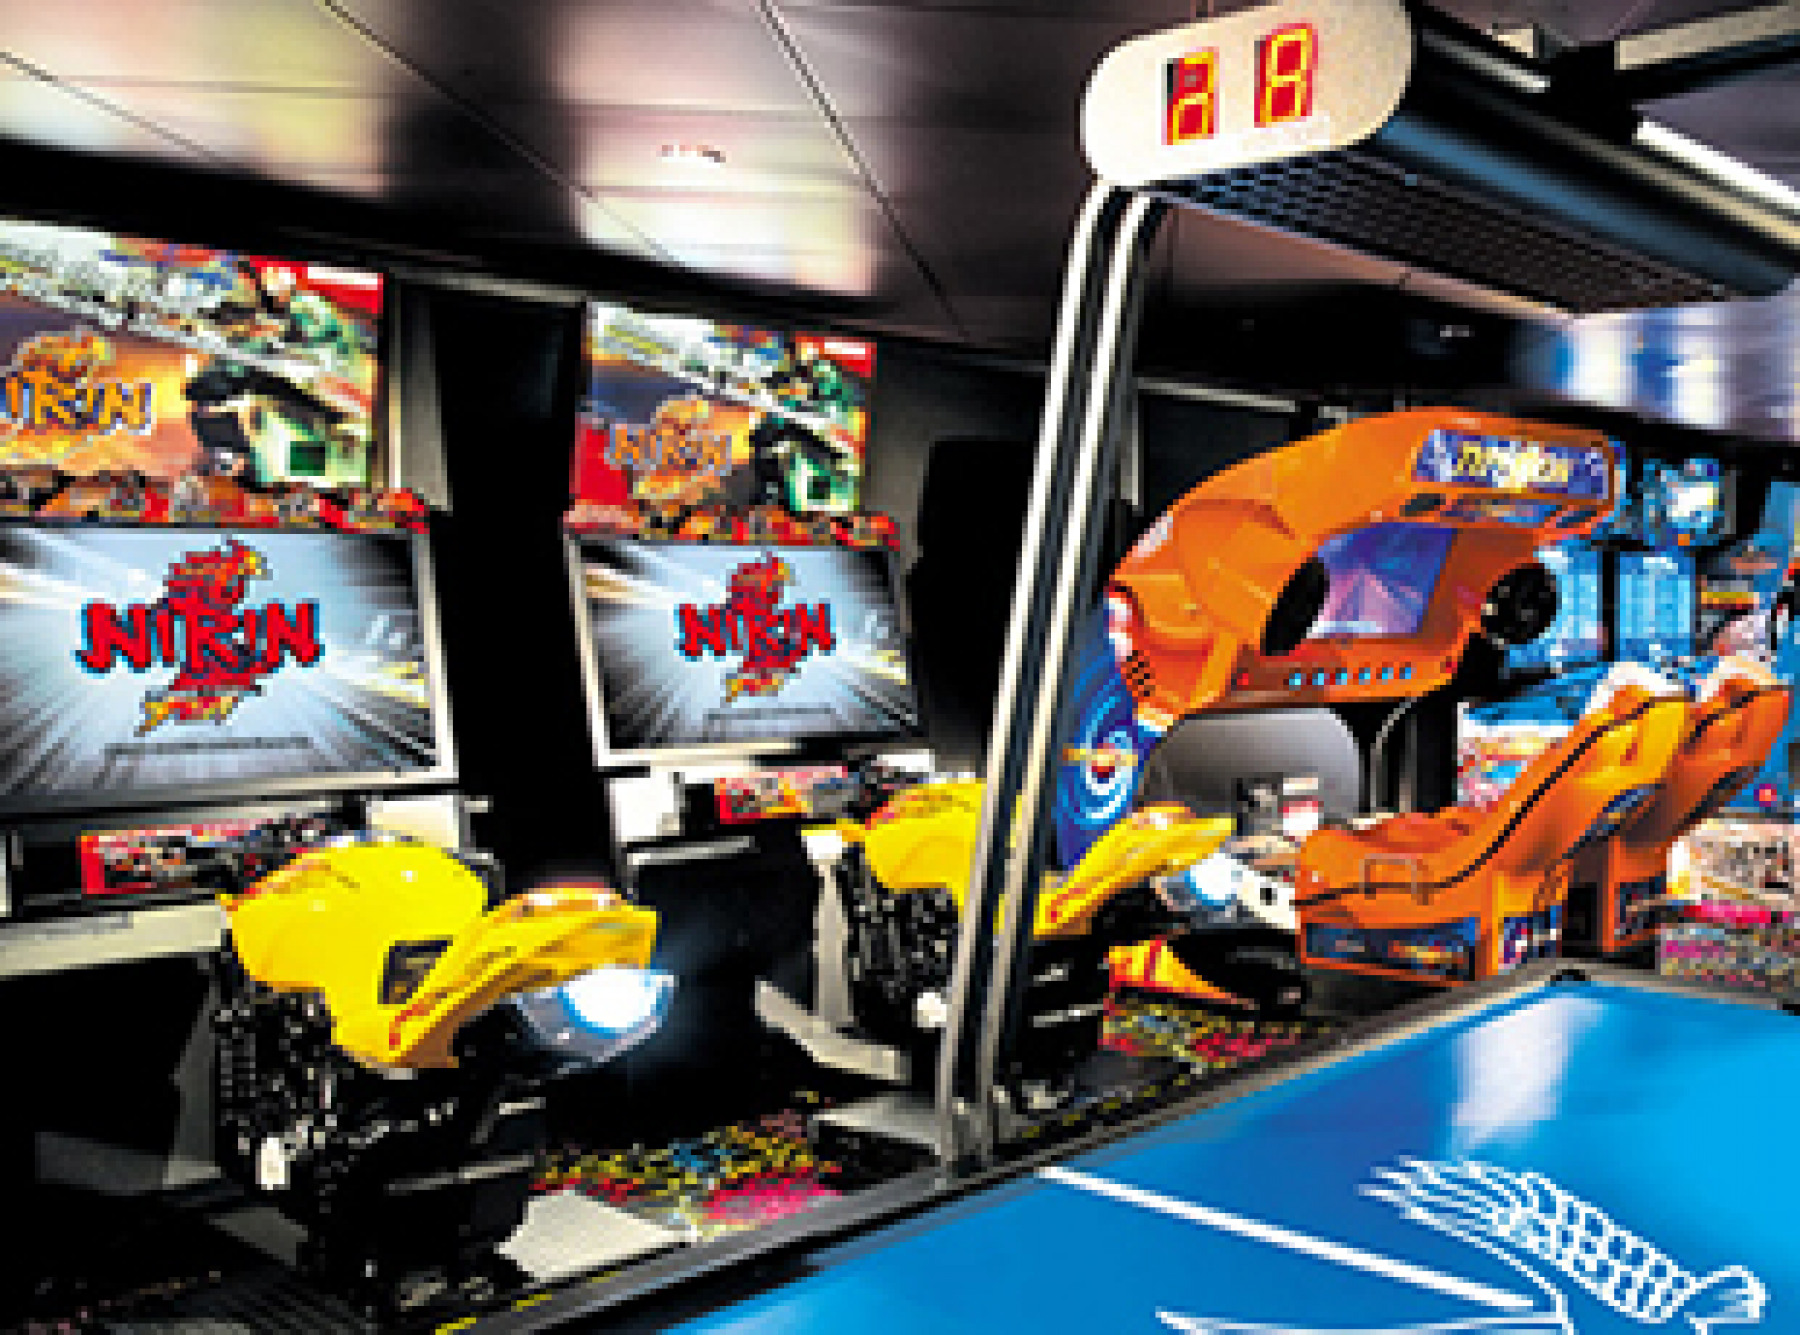 Norwegian Cruise Line Norwegian Epic Interior Video Arcade.jpg